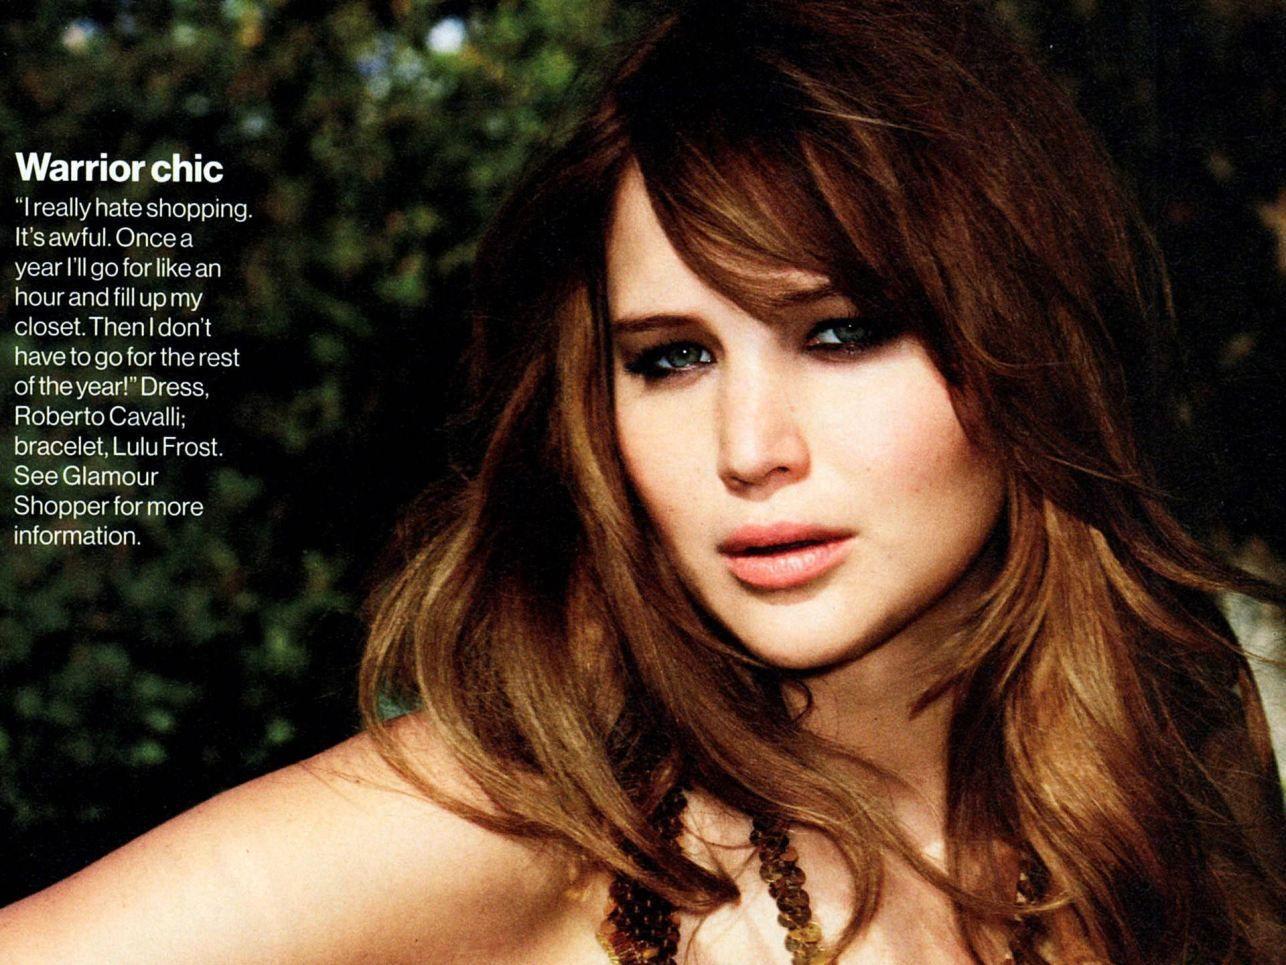 Jennifer Lawrence Wallpaper #21 - Apnatimepass.com